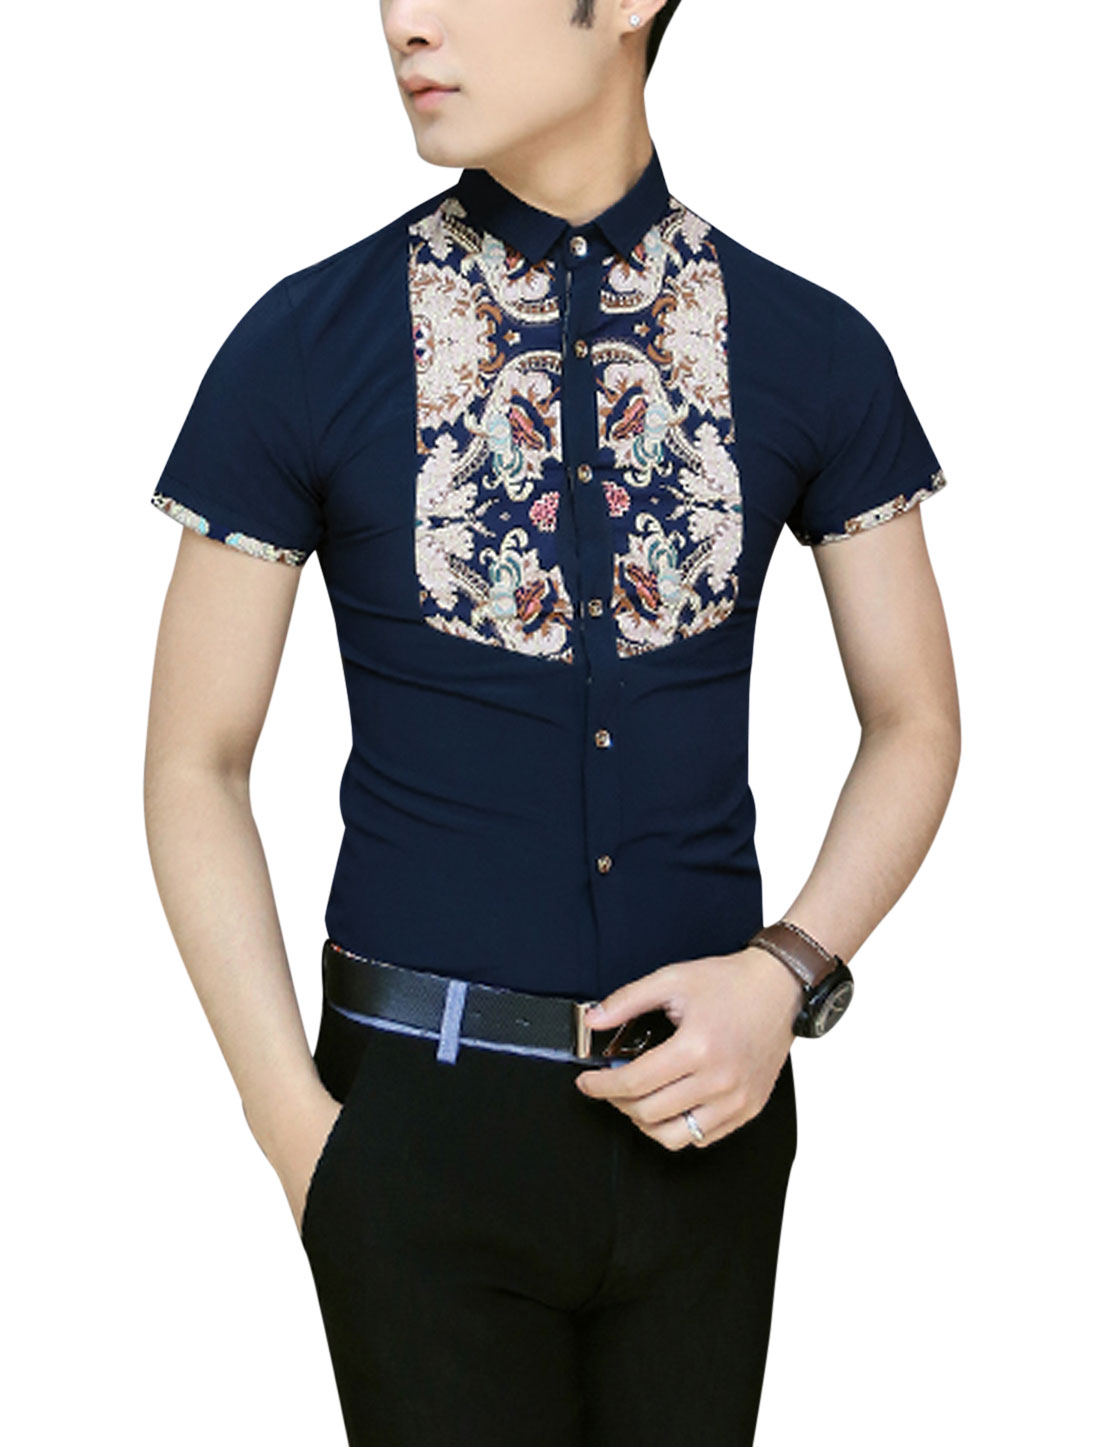 Men Slim Fit Floral Prints Front Panel Design Shirt Navy Blue S